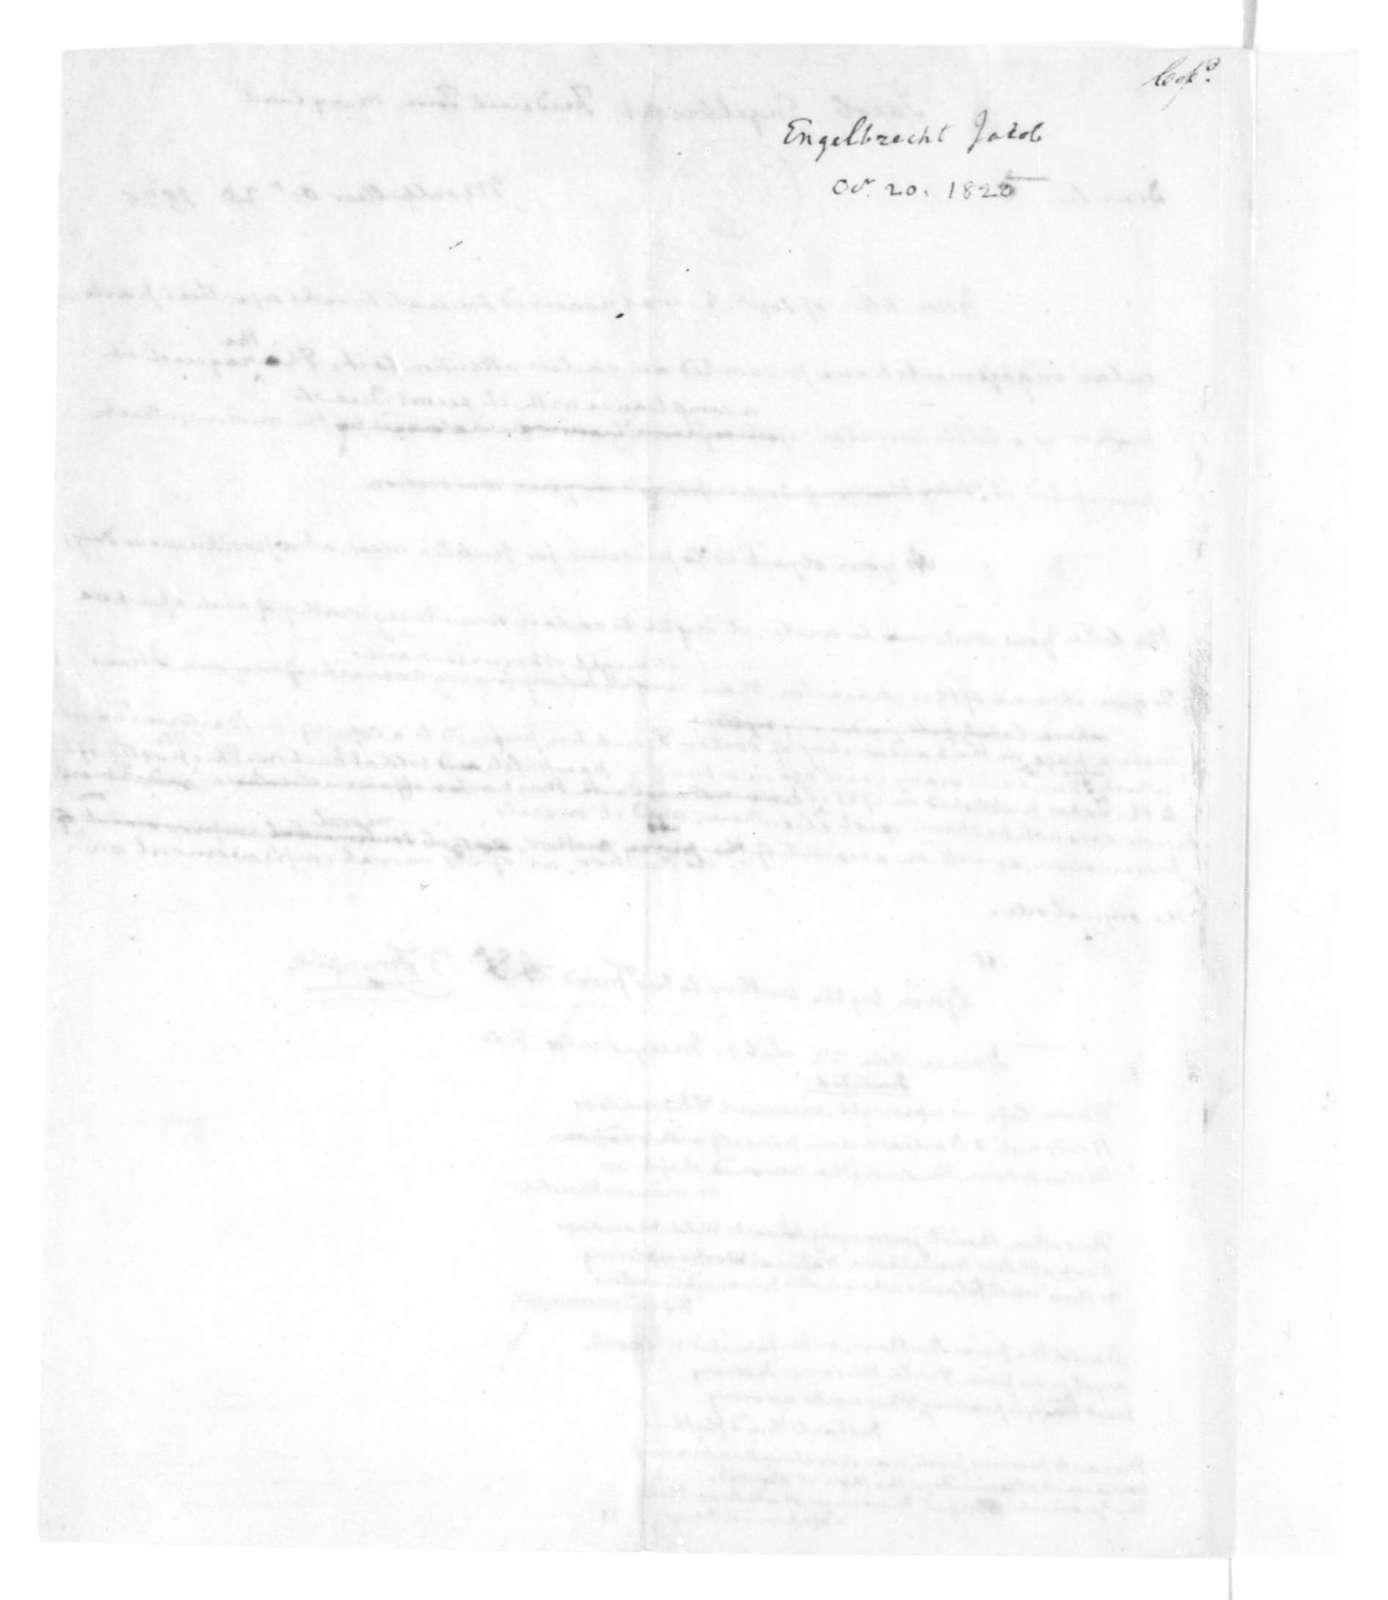 James Madison to Jacob Engelbrecht, October 20, 1825.